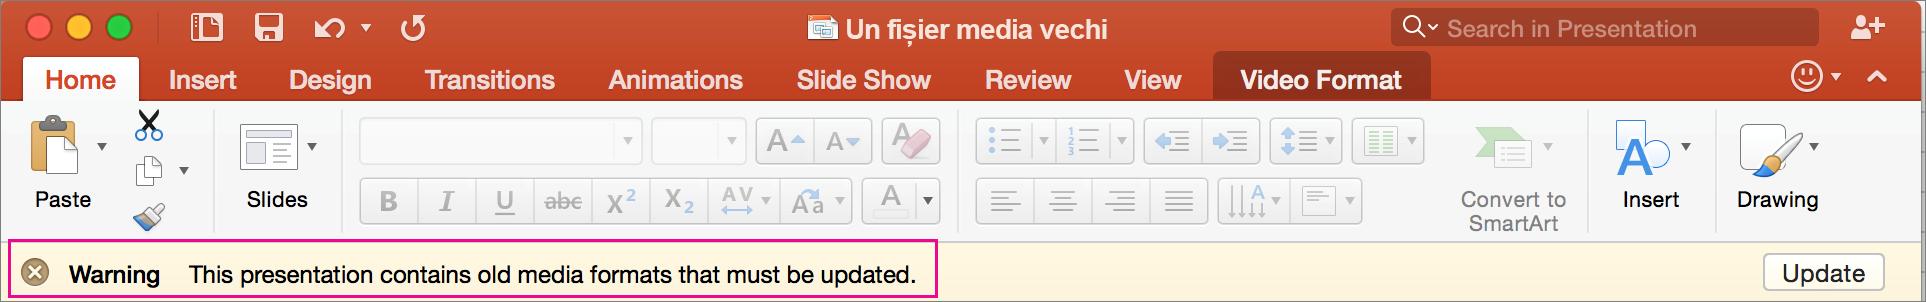 PowerPoint 2016 pentru Mac, format media vechi